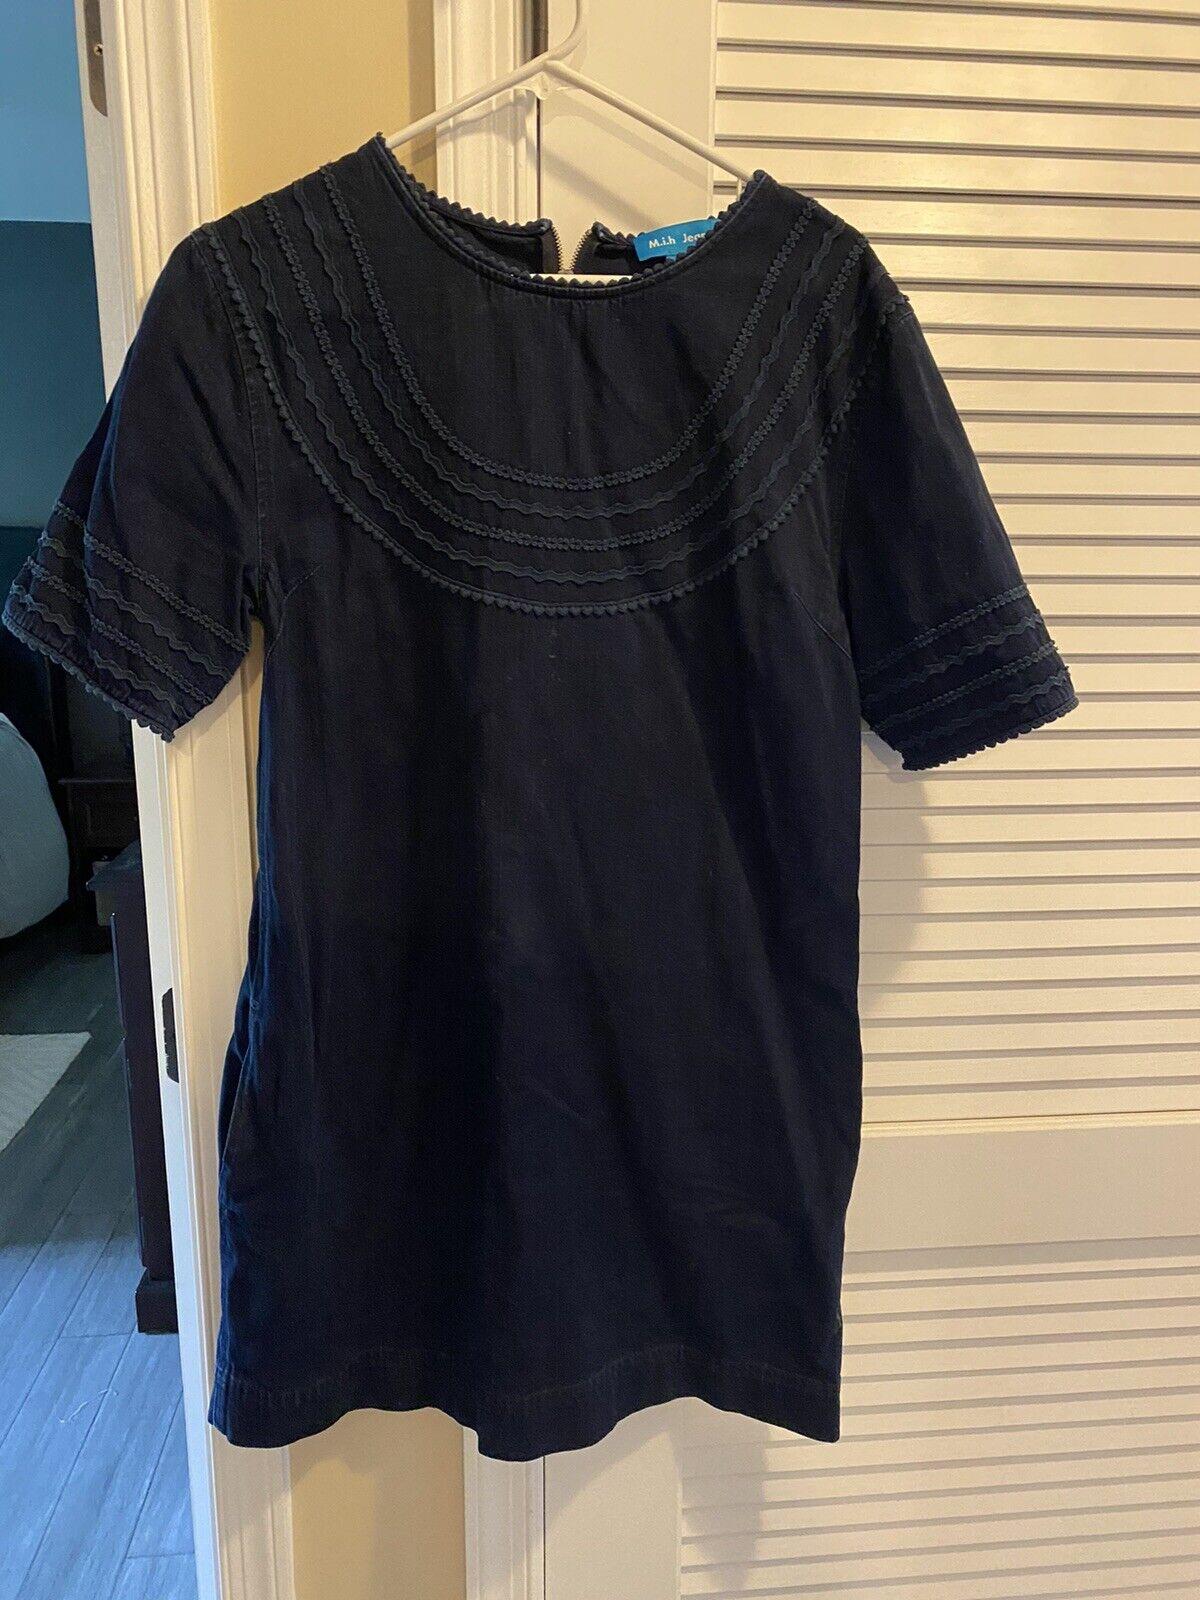 MIH Jeans Embroidered Denim Dress Dark Wash Medium - image 1